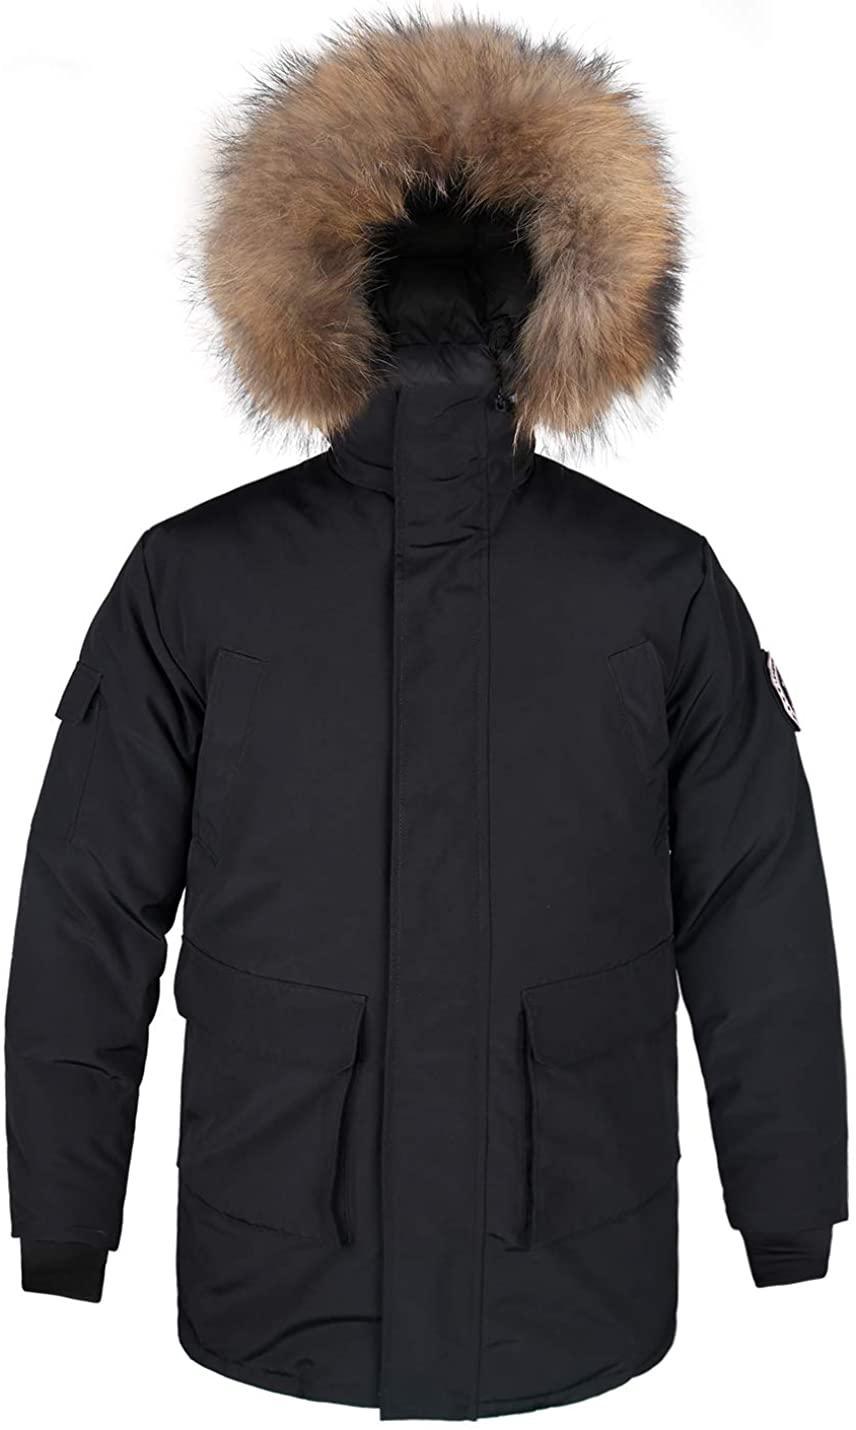 Men's Goose Down Jacket Parka Waterproof Winter Warm Outdoor Hooded Ski Jacket with Real Fur Hood